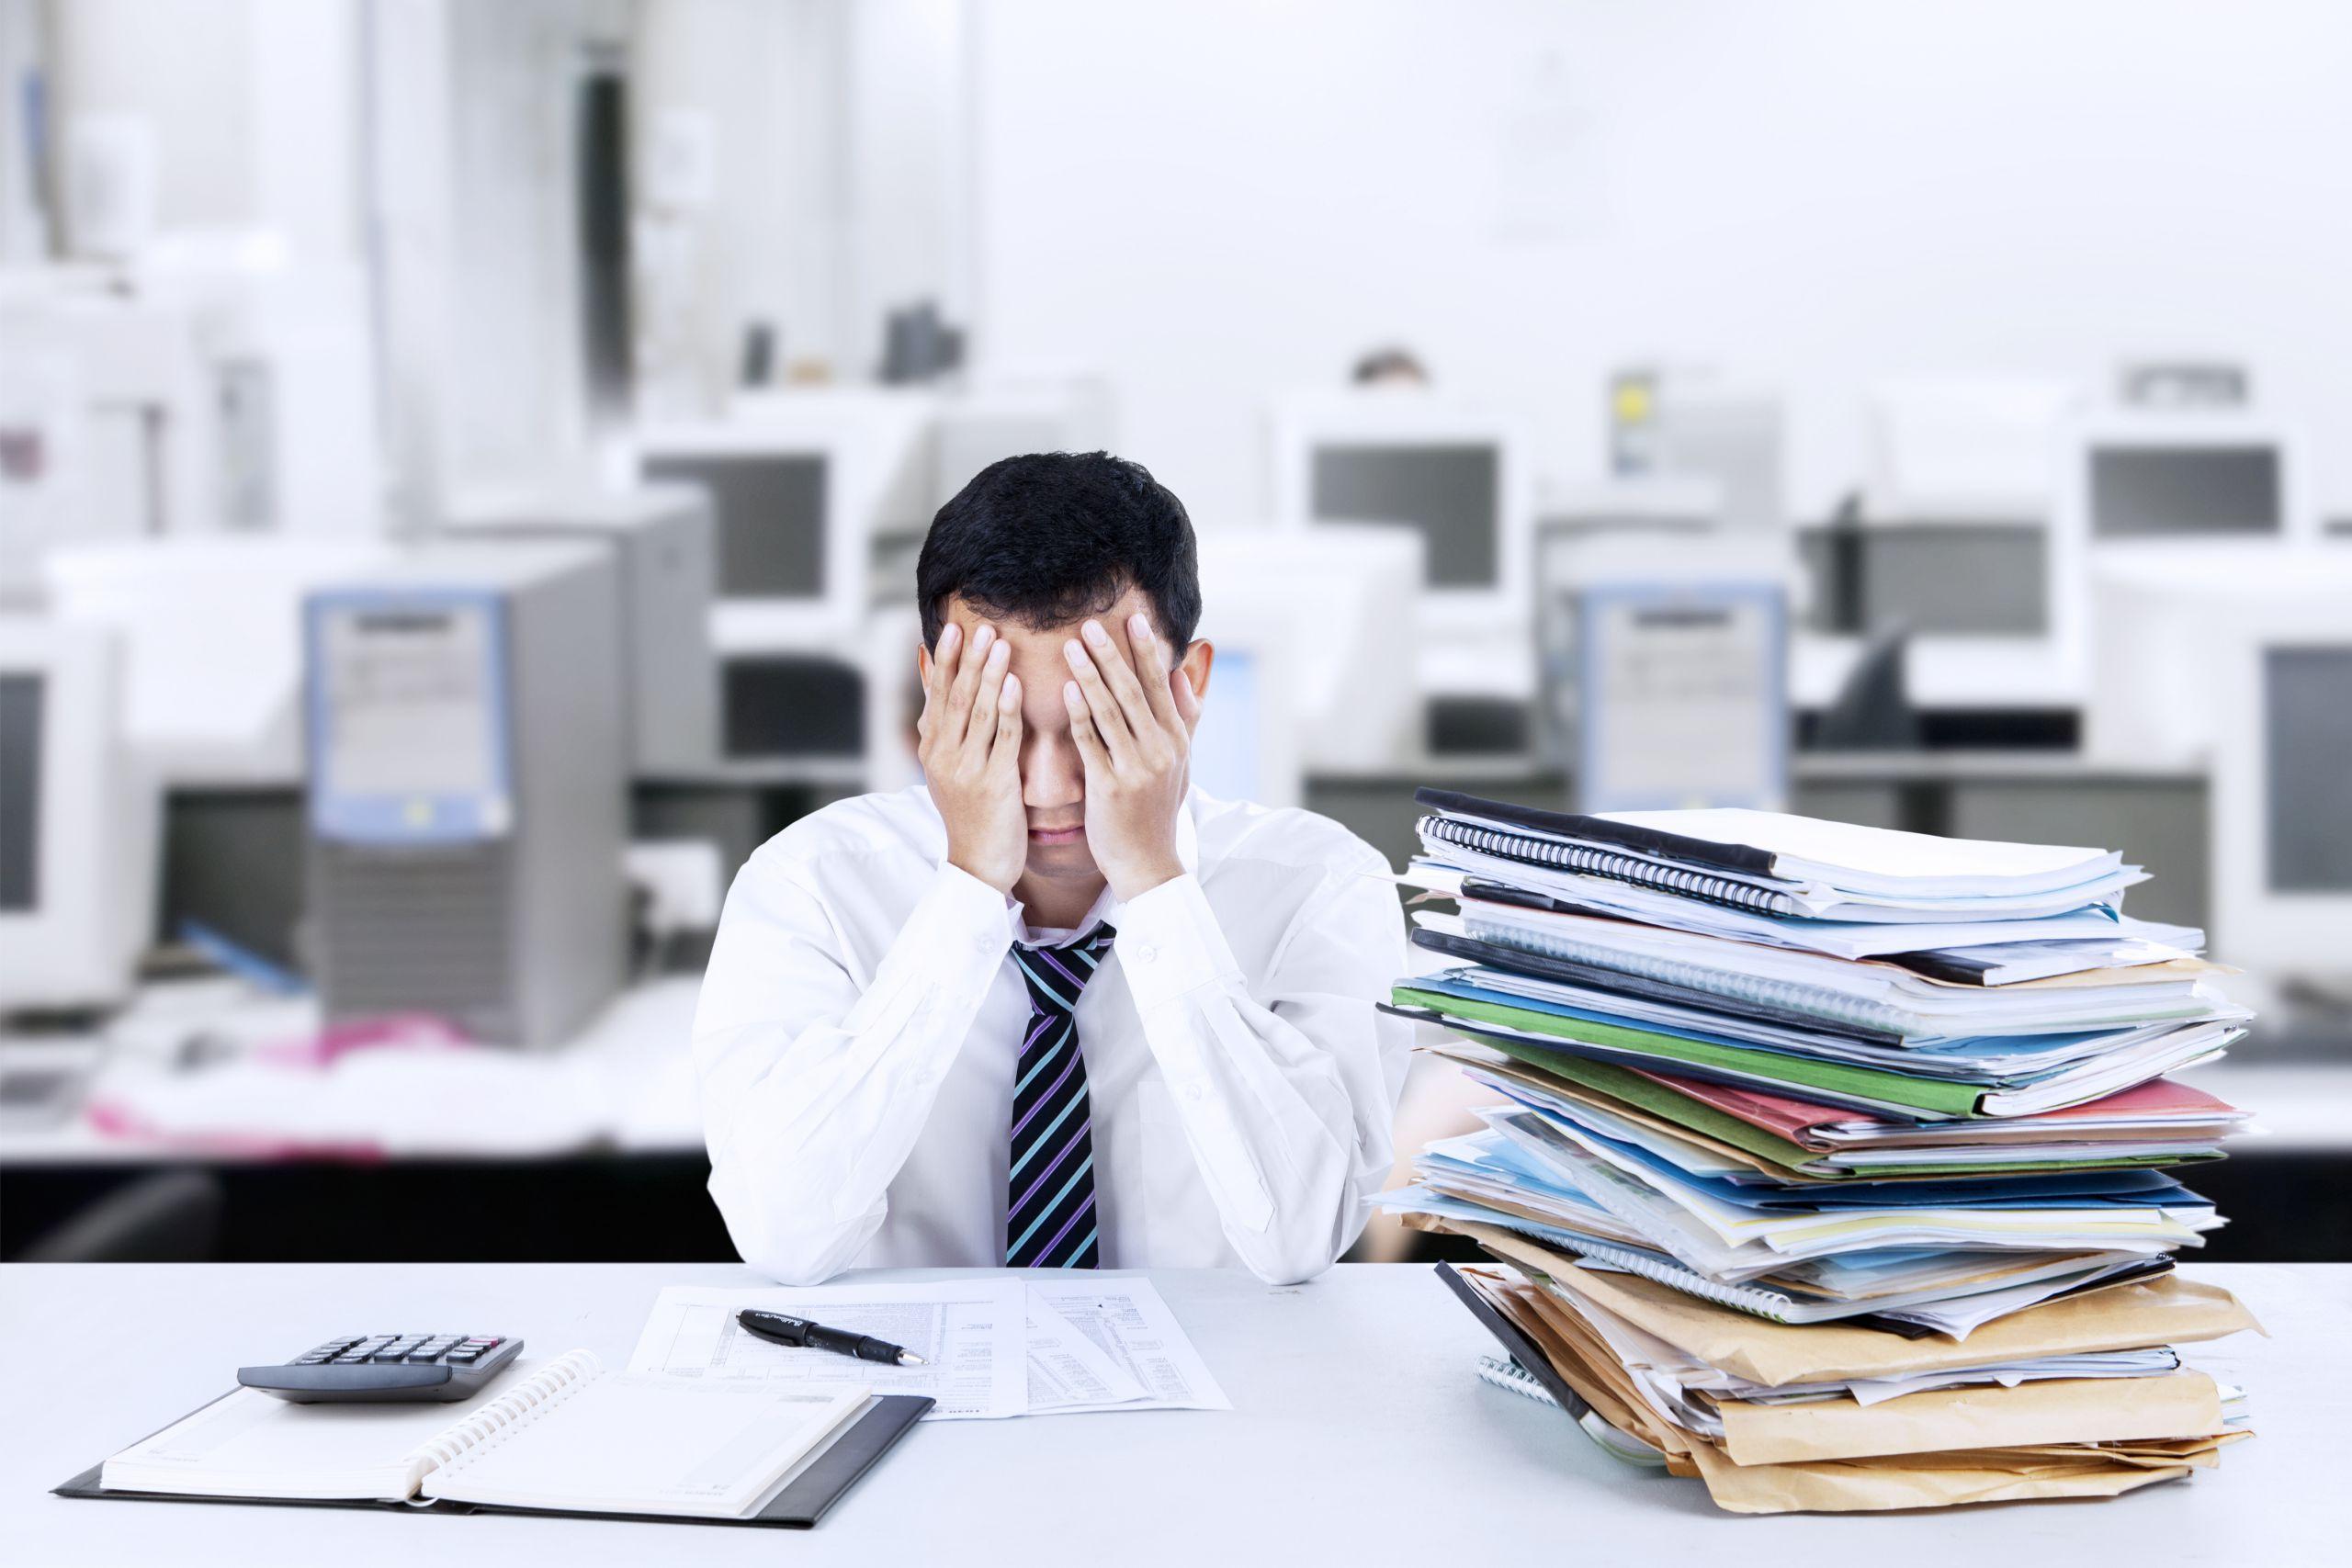 Digitaler Arbeitsplatz Wo es am meisten klemmt   Business User